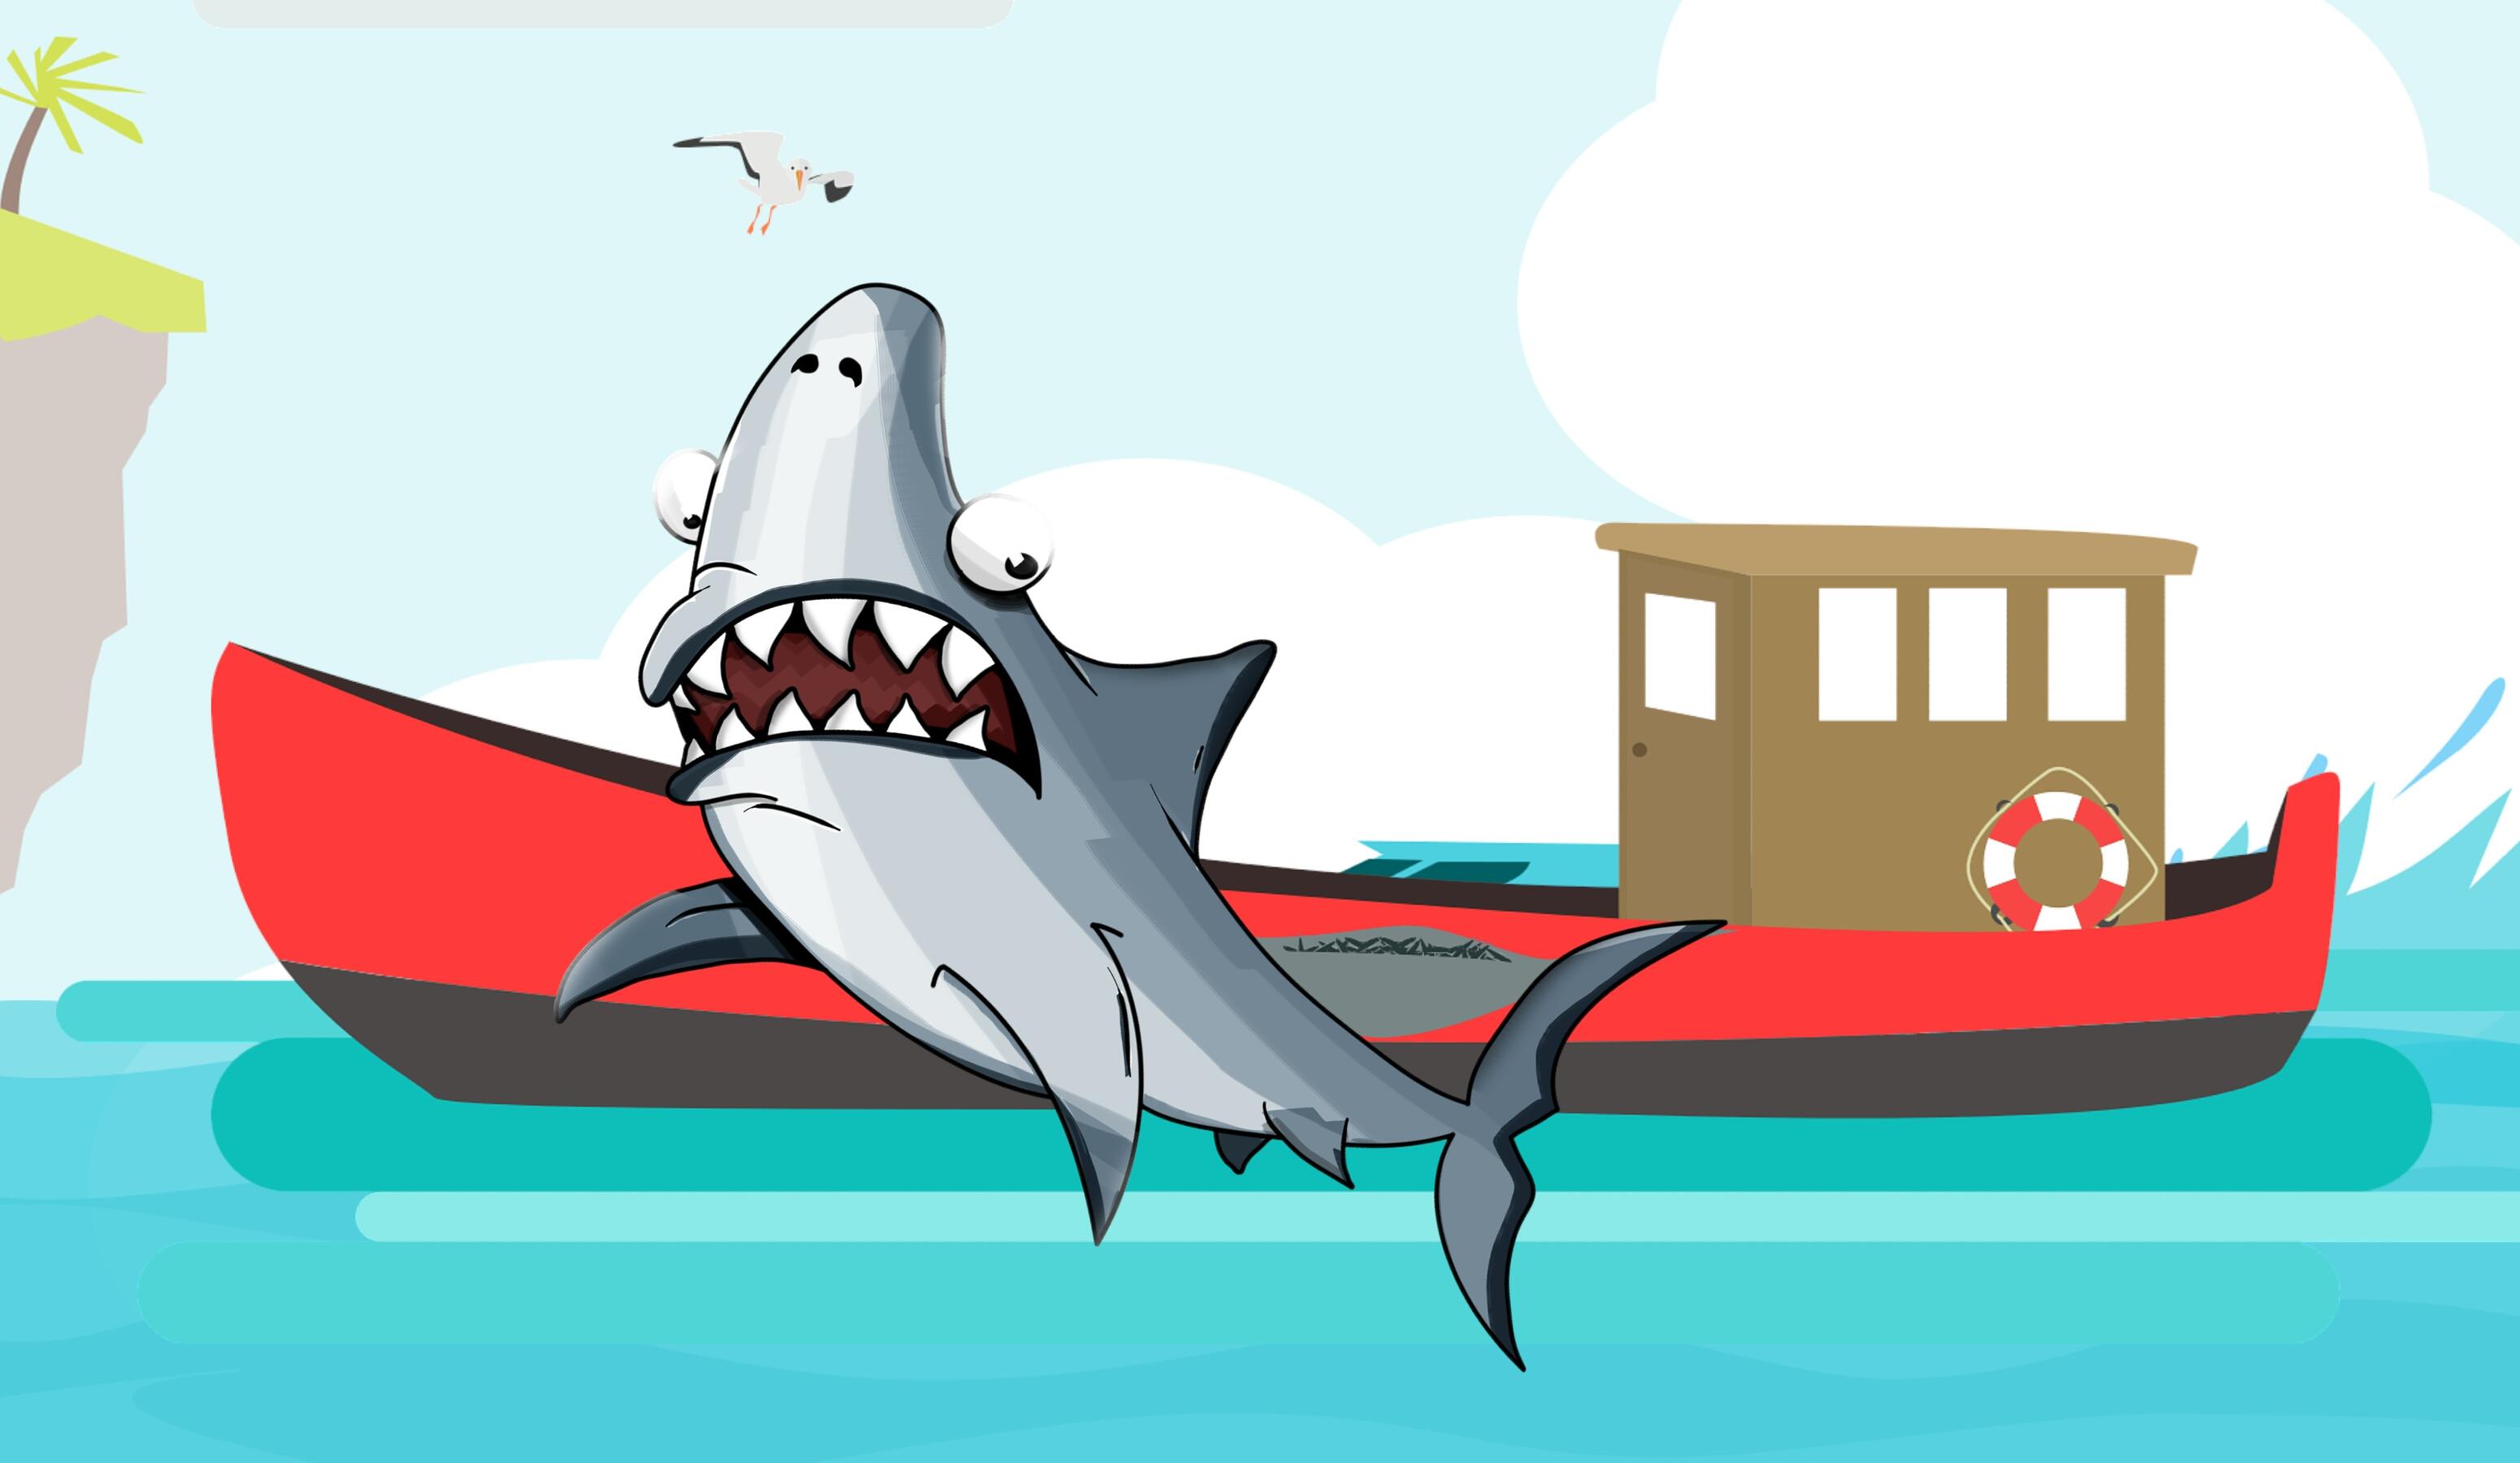 Gambar Hewan Gambar Kartun Awan Awan Komik Ikan Lucu